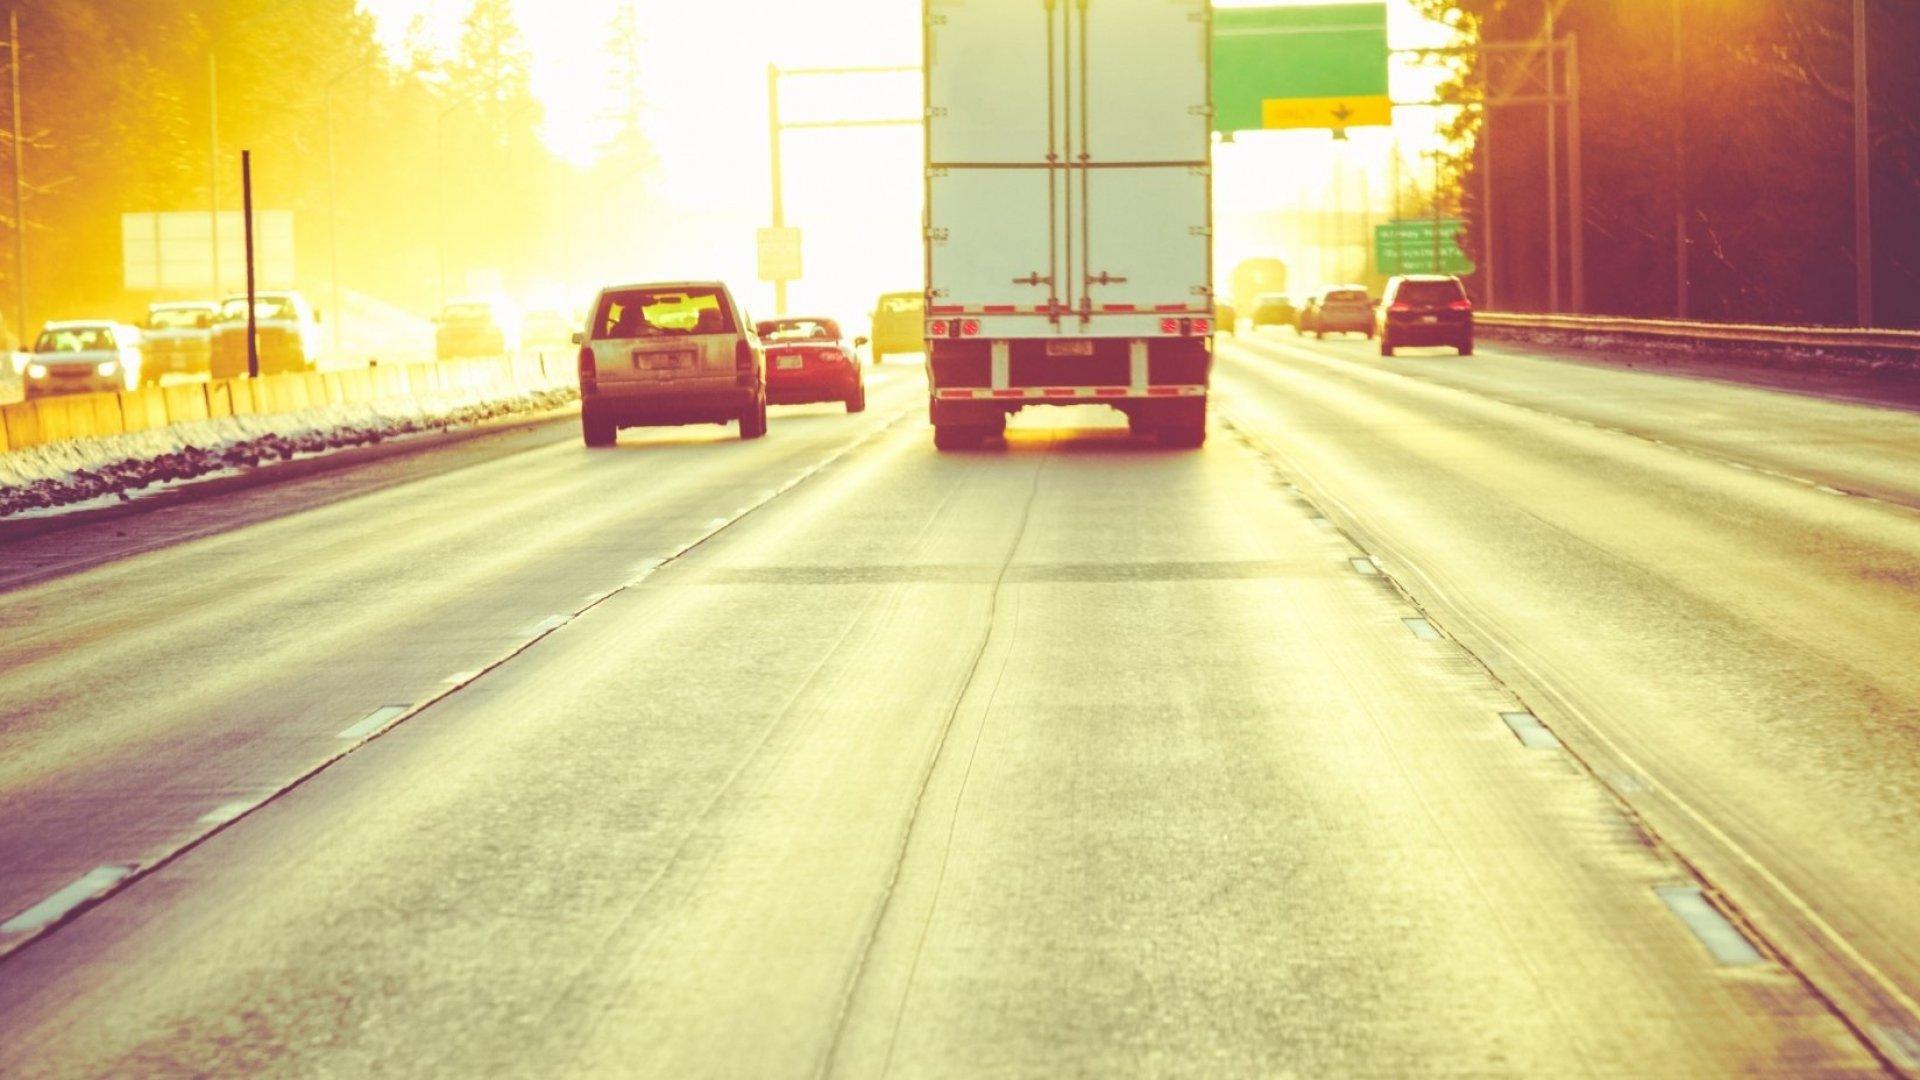 Uber's next stop: long-haul trucking.